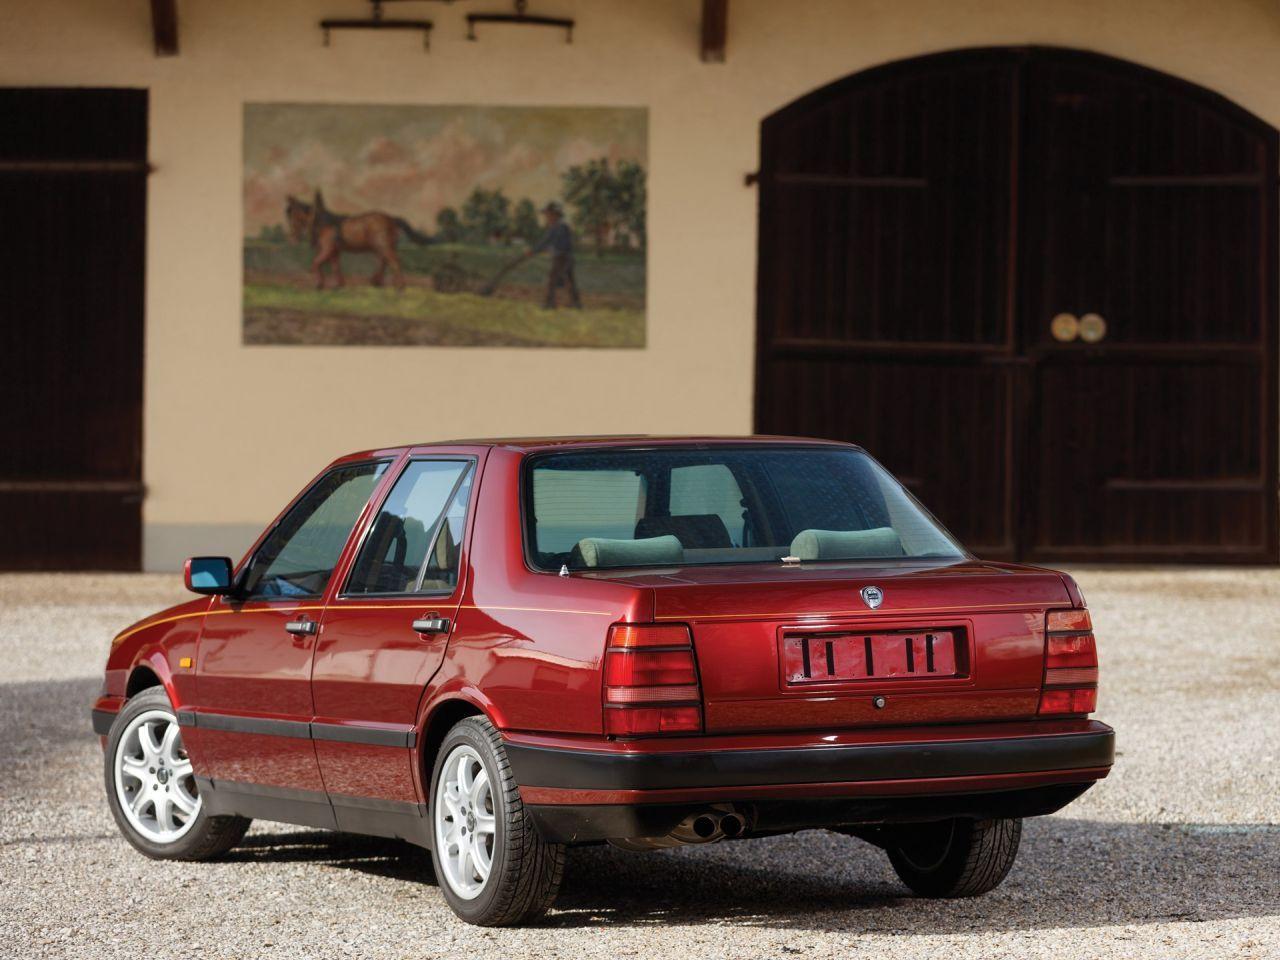 Lancia Thema 8.32 de 1991 - Costard, champagne... Et frustration ! 25